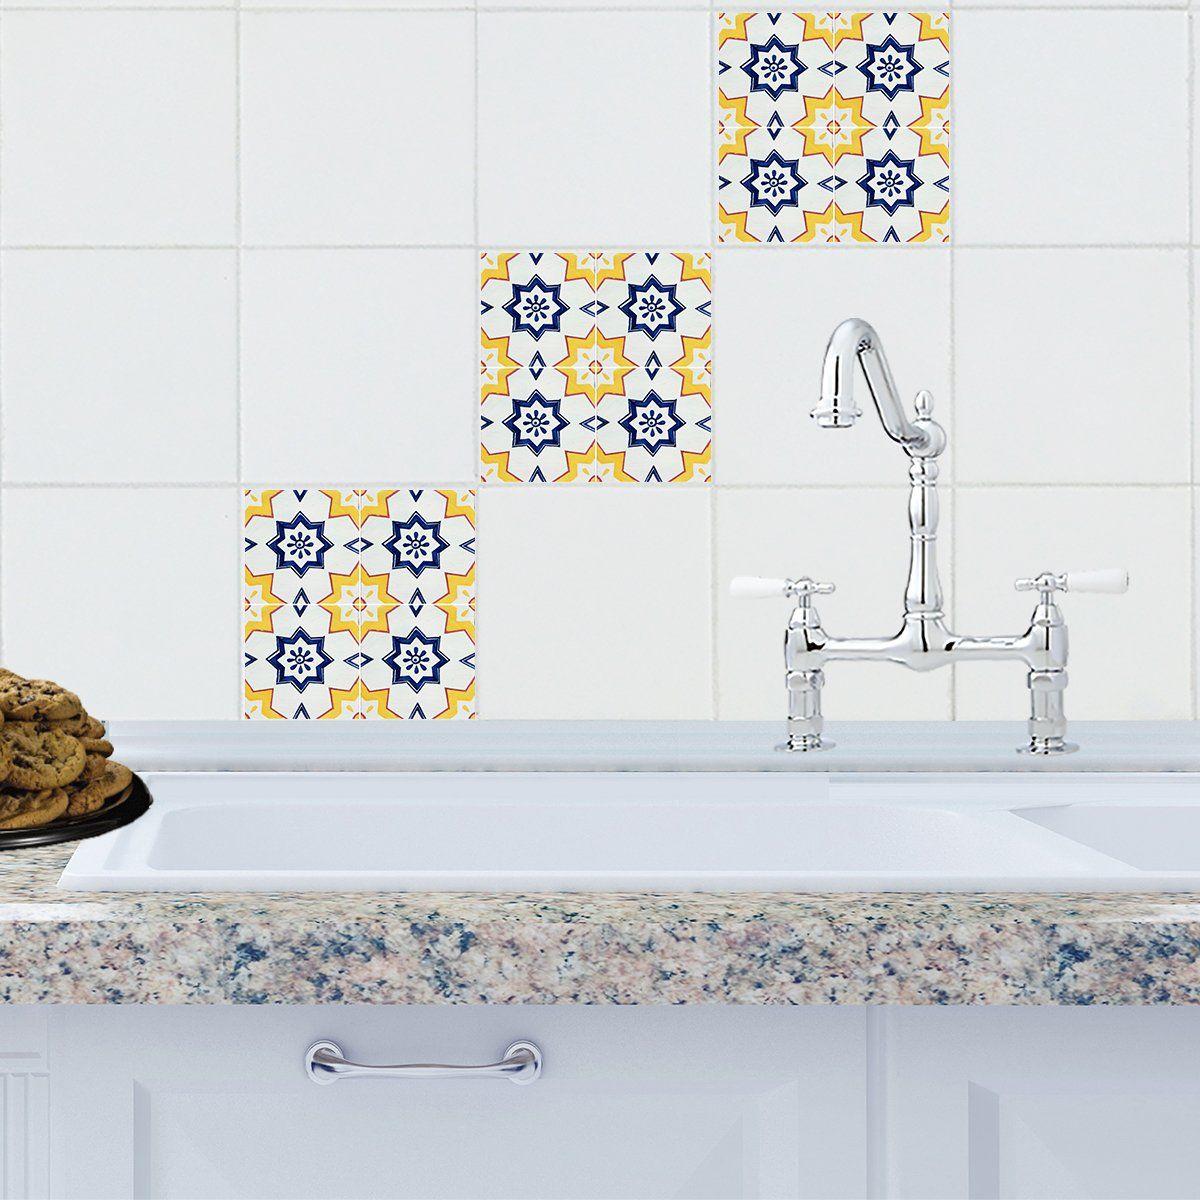 Mosaic Malaga Tile Decals   Tile decals, Malaga and Mosaics